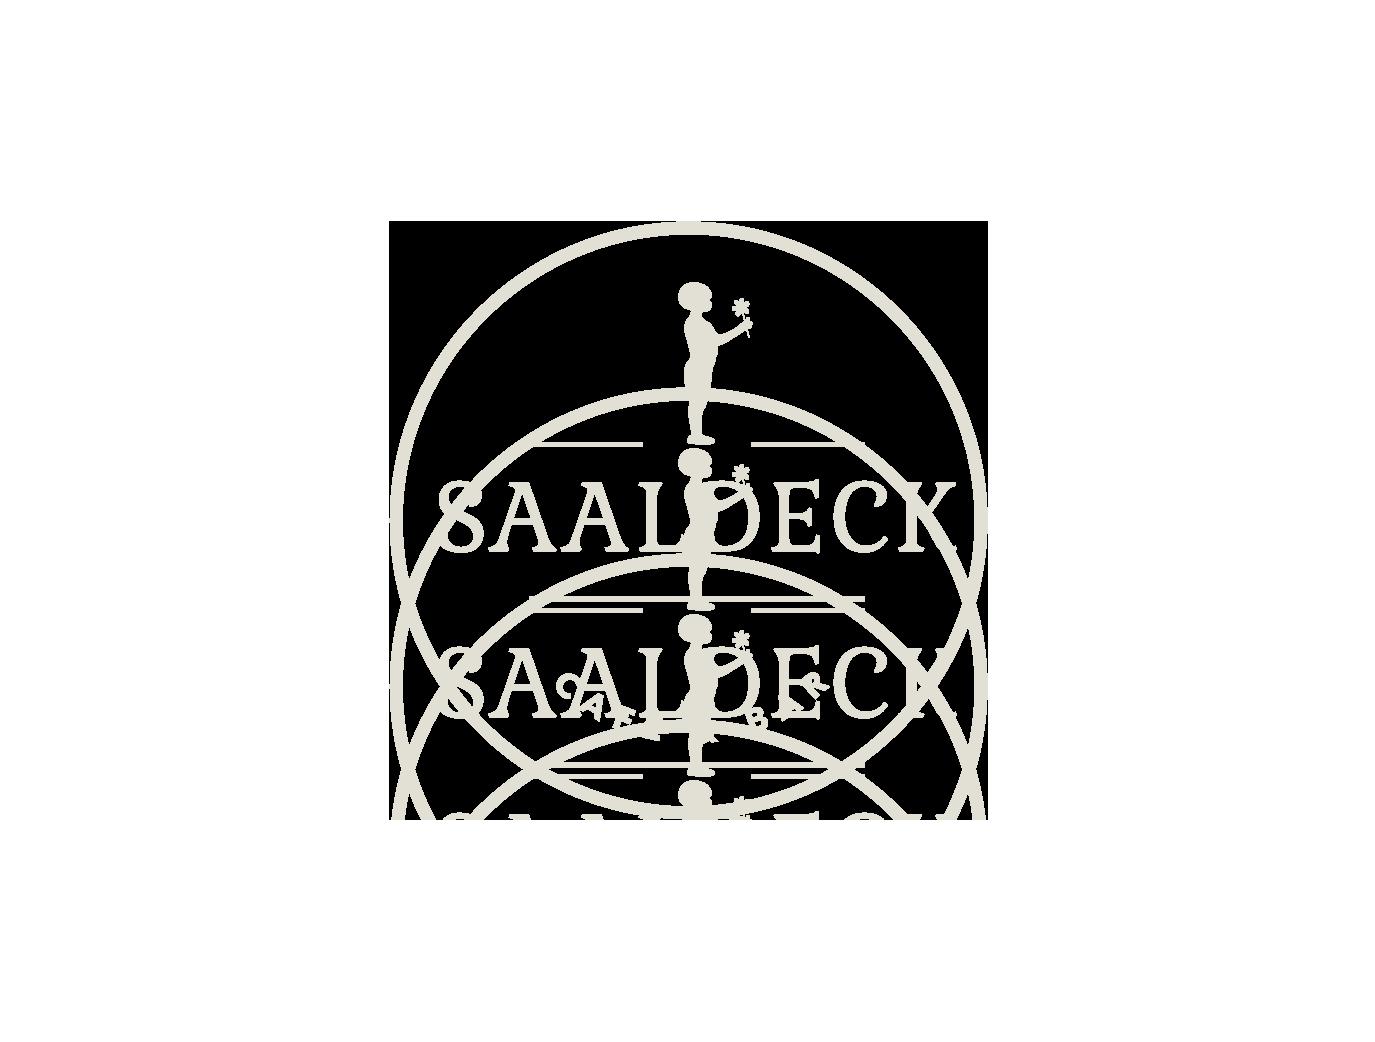 Saaldeck Café & Bar in Berlin Friedrichshain